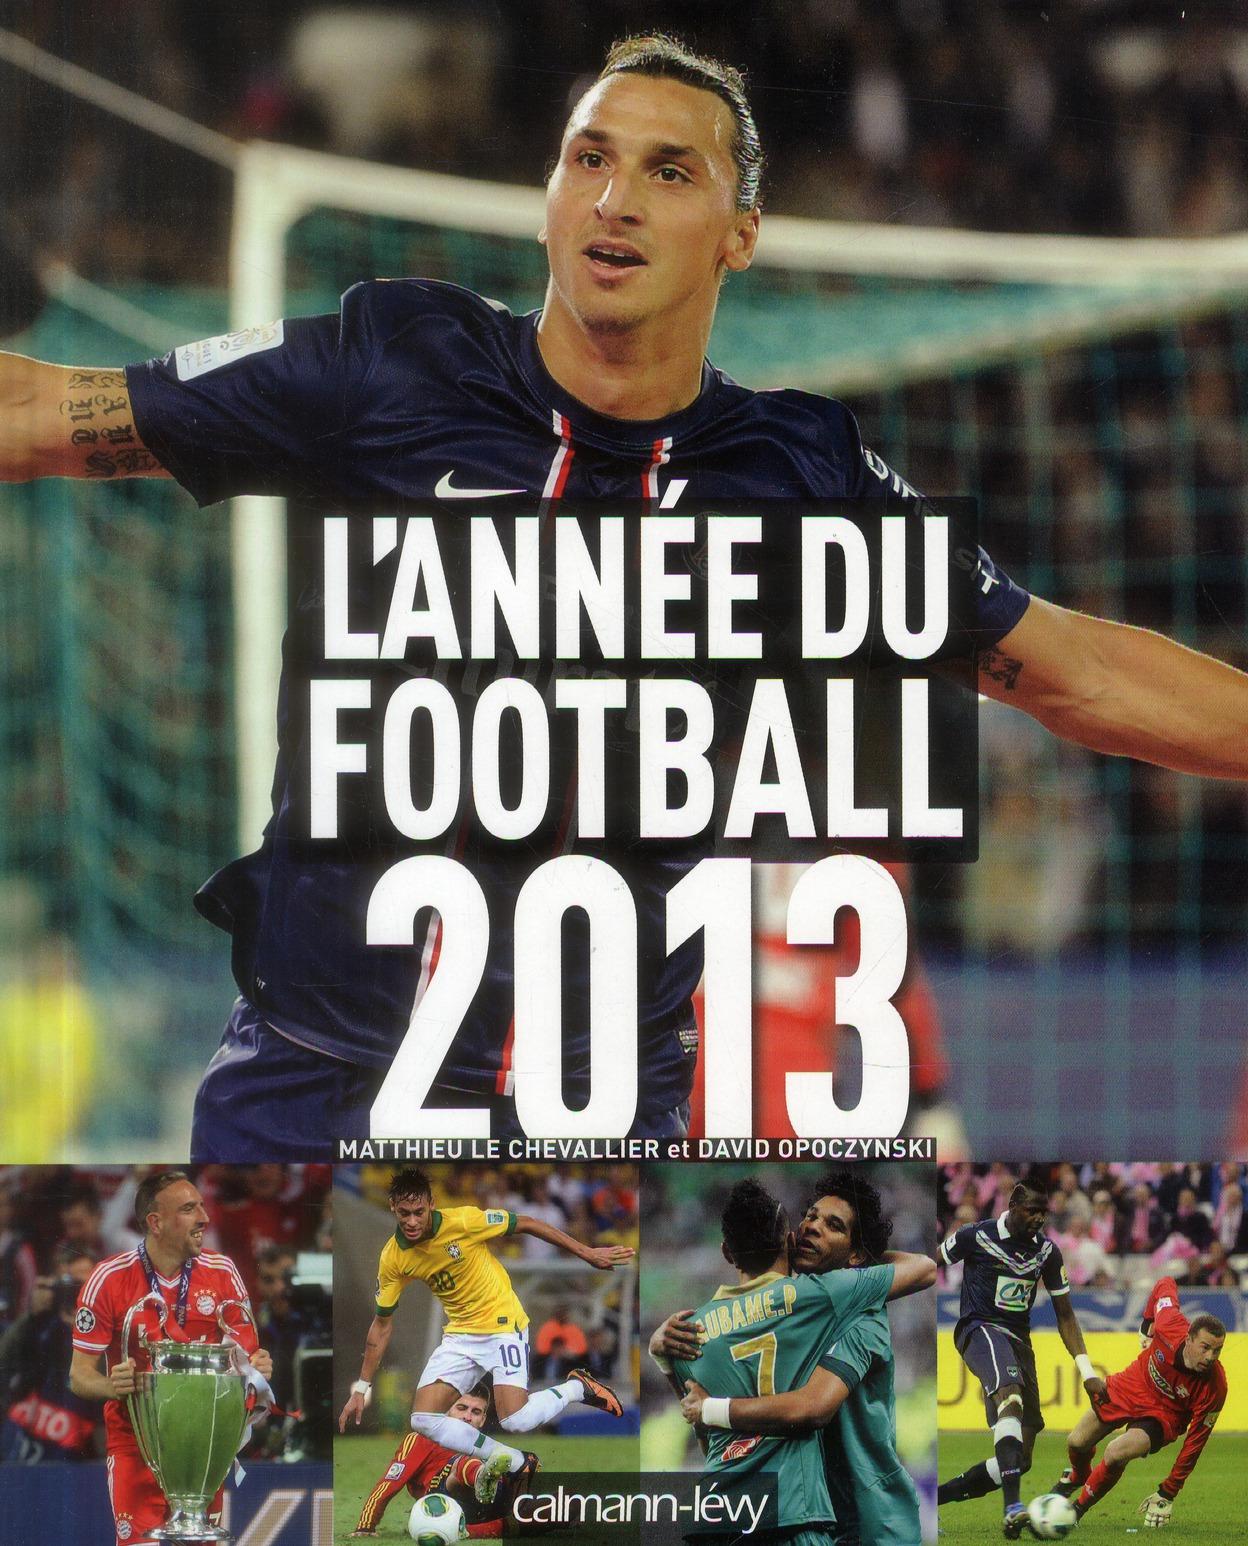 L'ANNEE DU FOOTBALL 2013 -N 41-